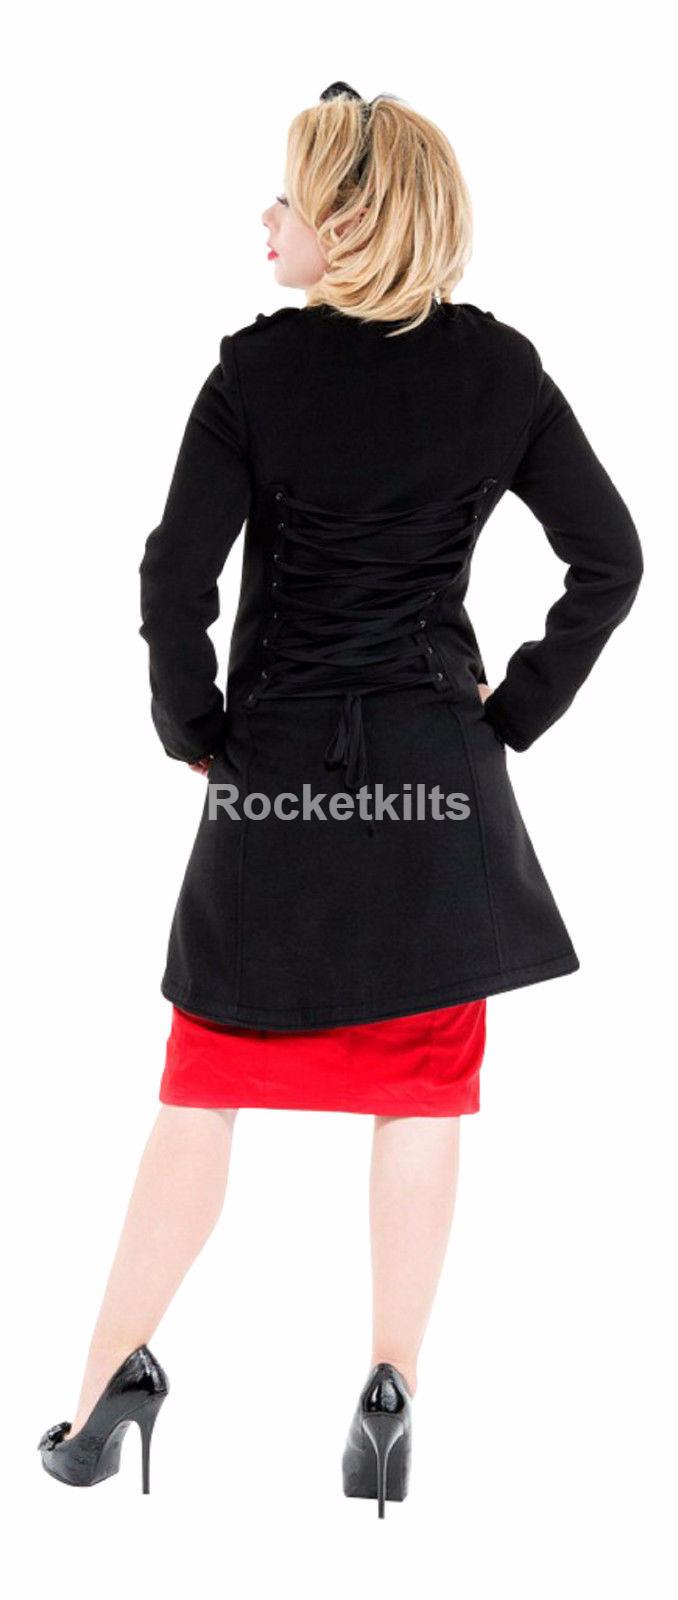 Ladies New Black Military Gothic Style Braided Wool Coat Jacket